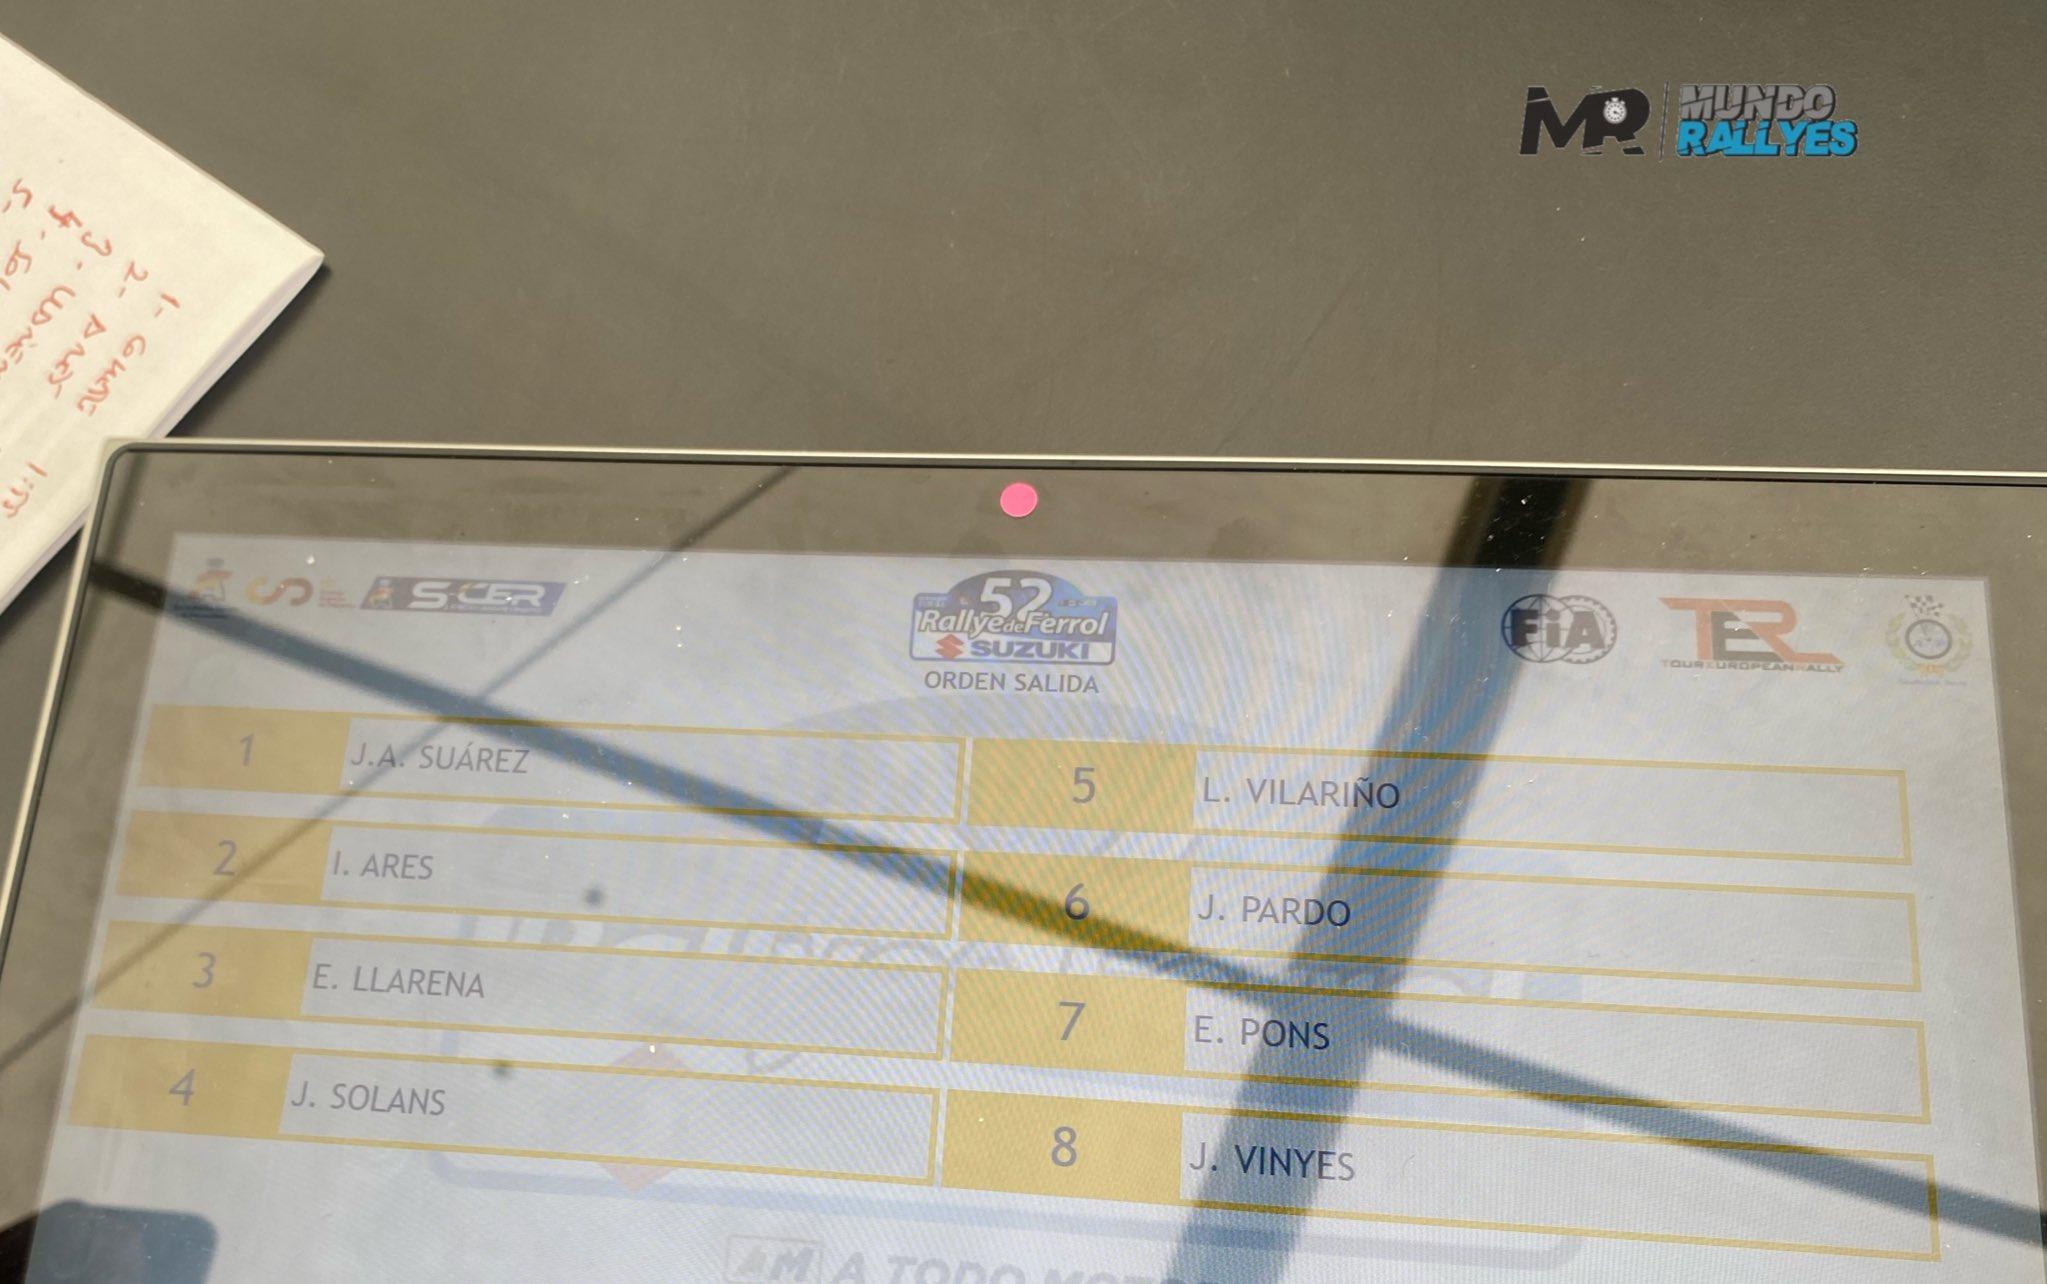 SCER + TER: 52º Rallye de Ferrol - Suzuki [20-21 Agosto] E9O6lAvXoAAnLdx?format=jpg&name=large